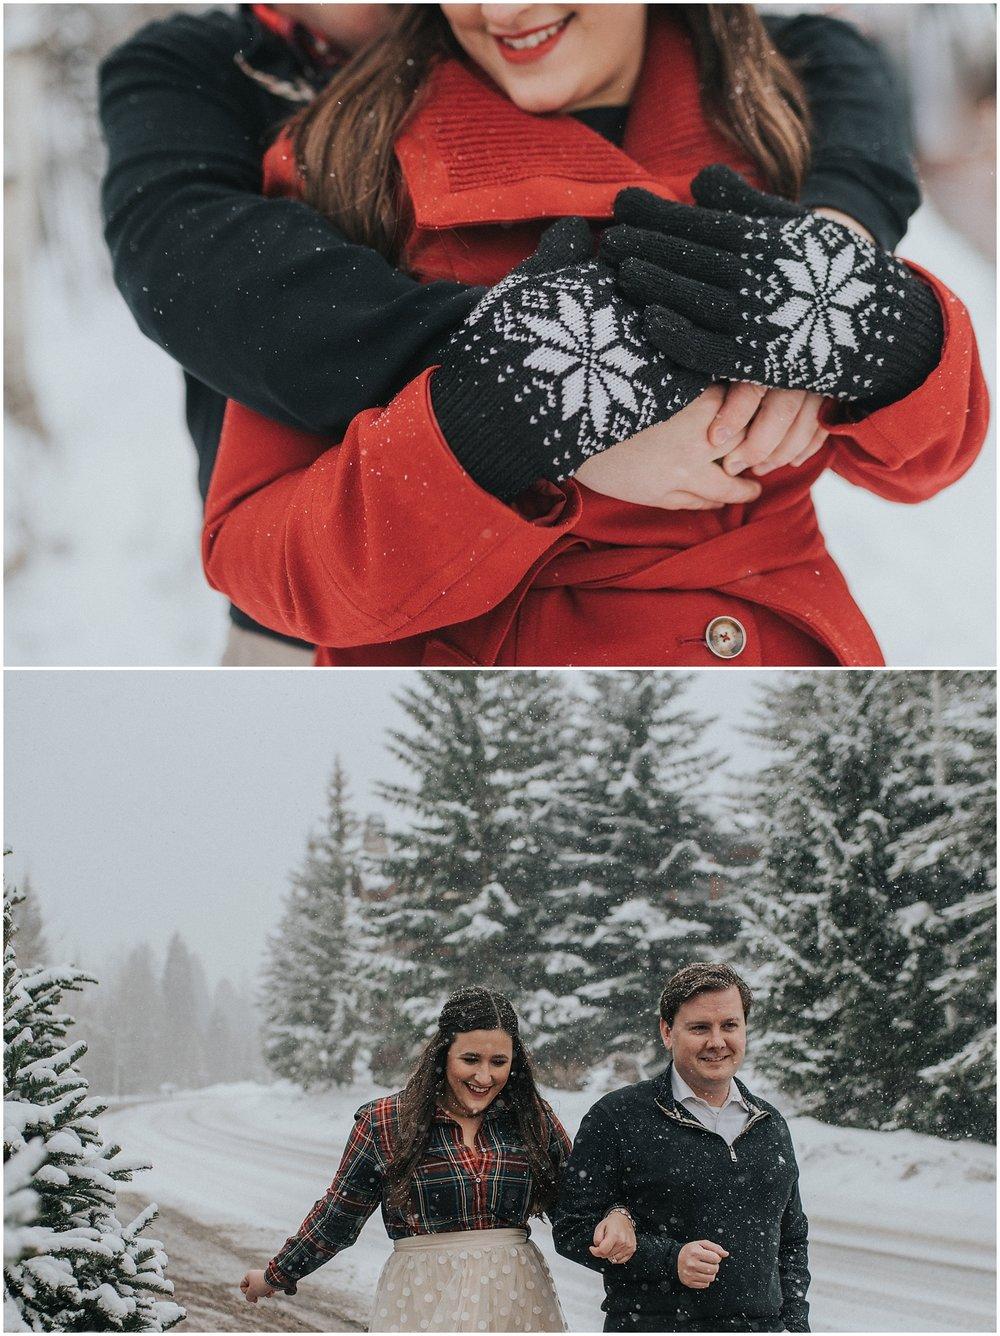 beavercreek_colorado_winter_engagement_photos_0025.jpg